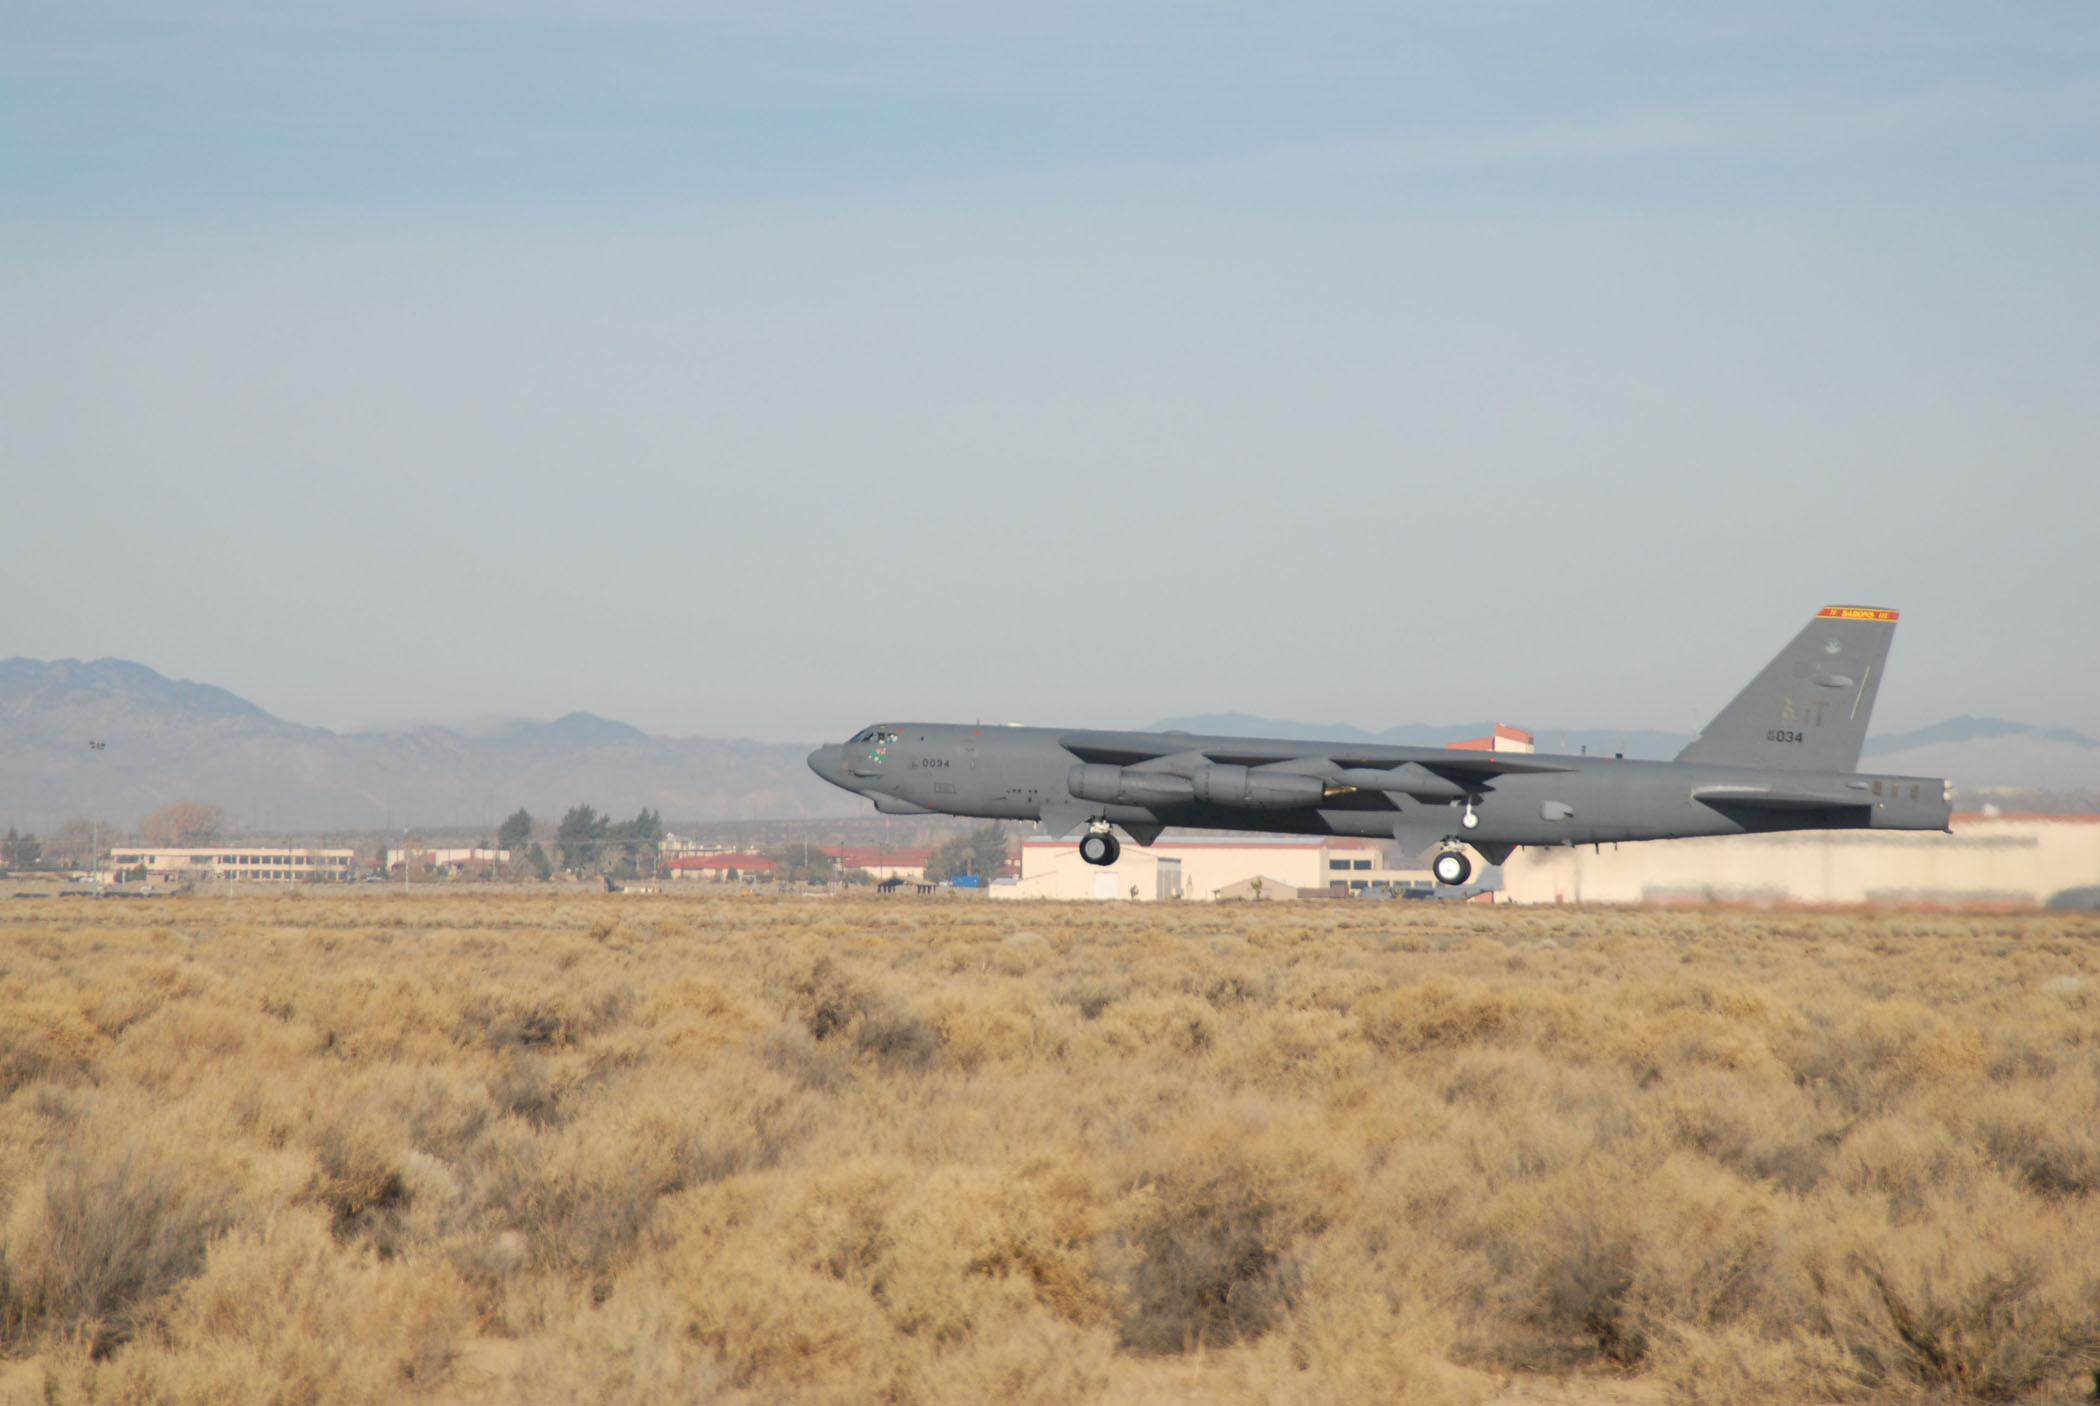 Test center commander pilots first eight-engine alternative